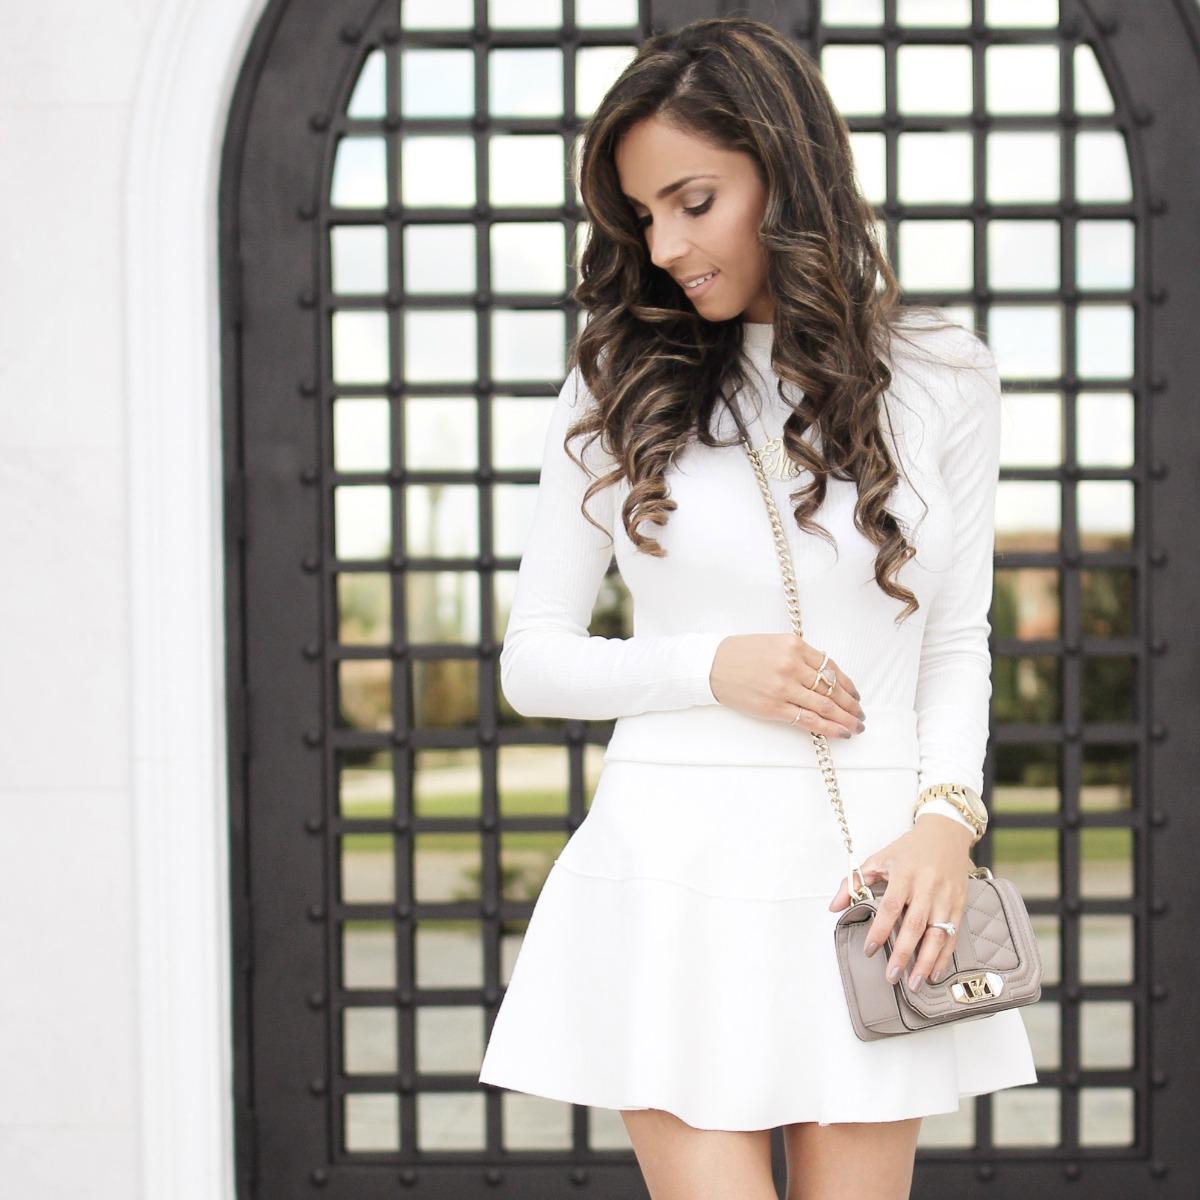 White top, white skirt